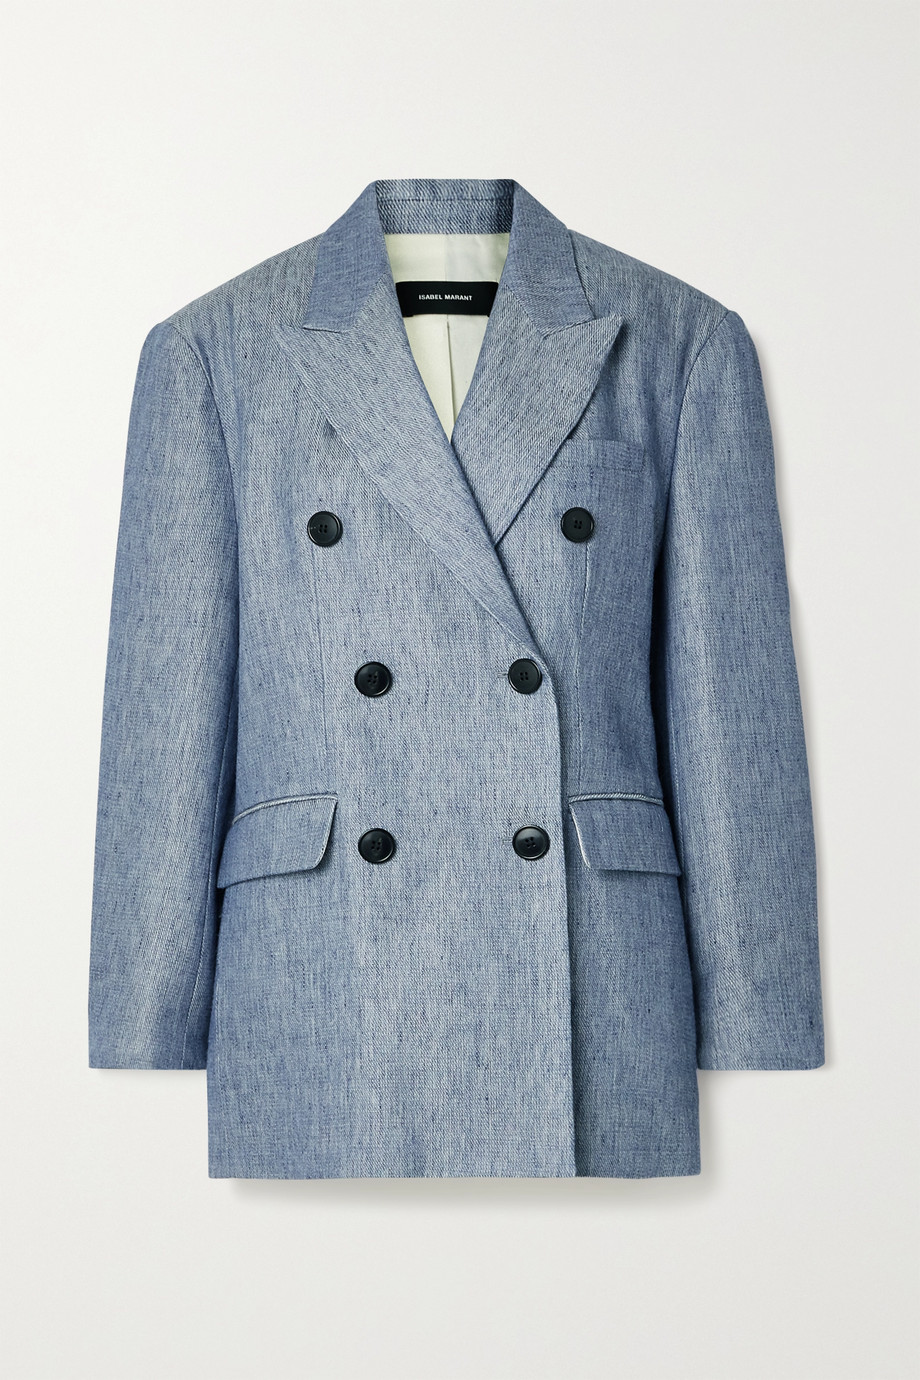 Isabel Marant Lhermine oversized double-breasted wool-blend blazer